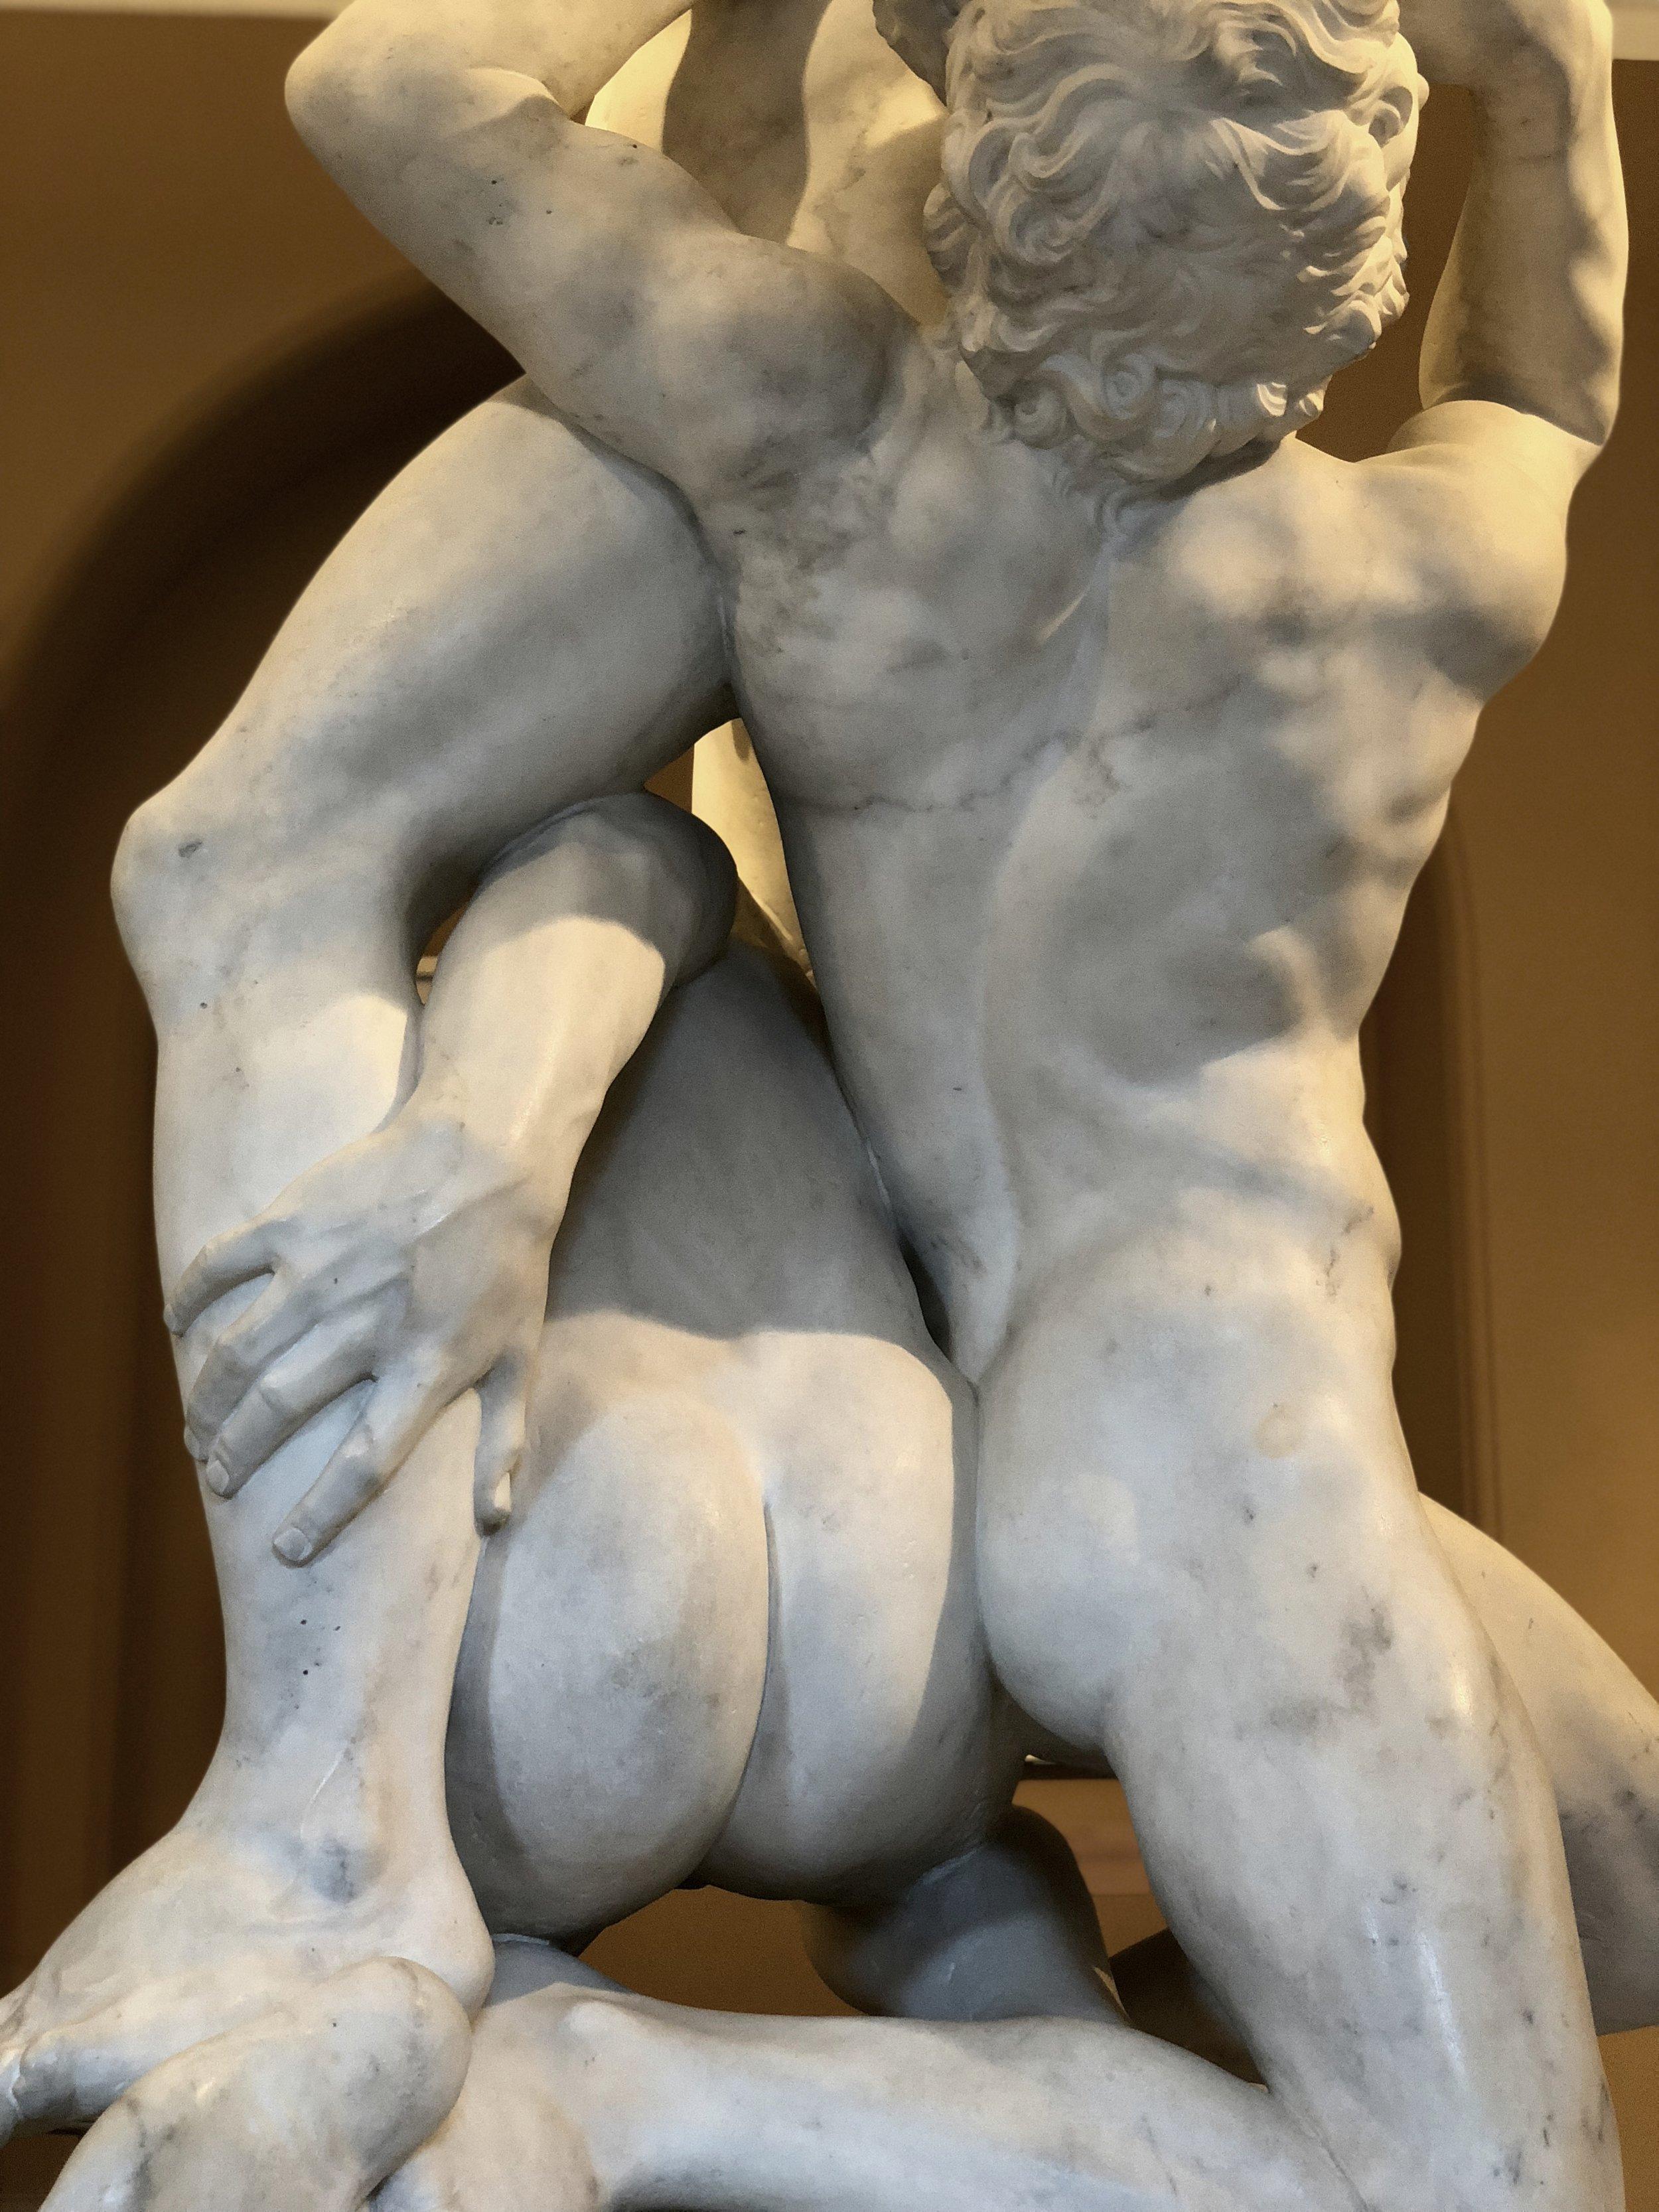 Scented Sculpture (26).jpg